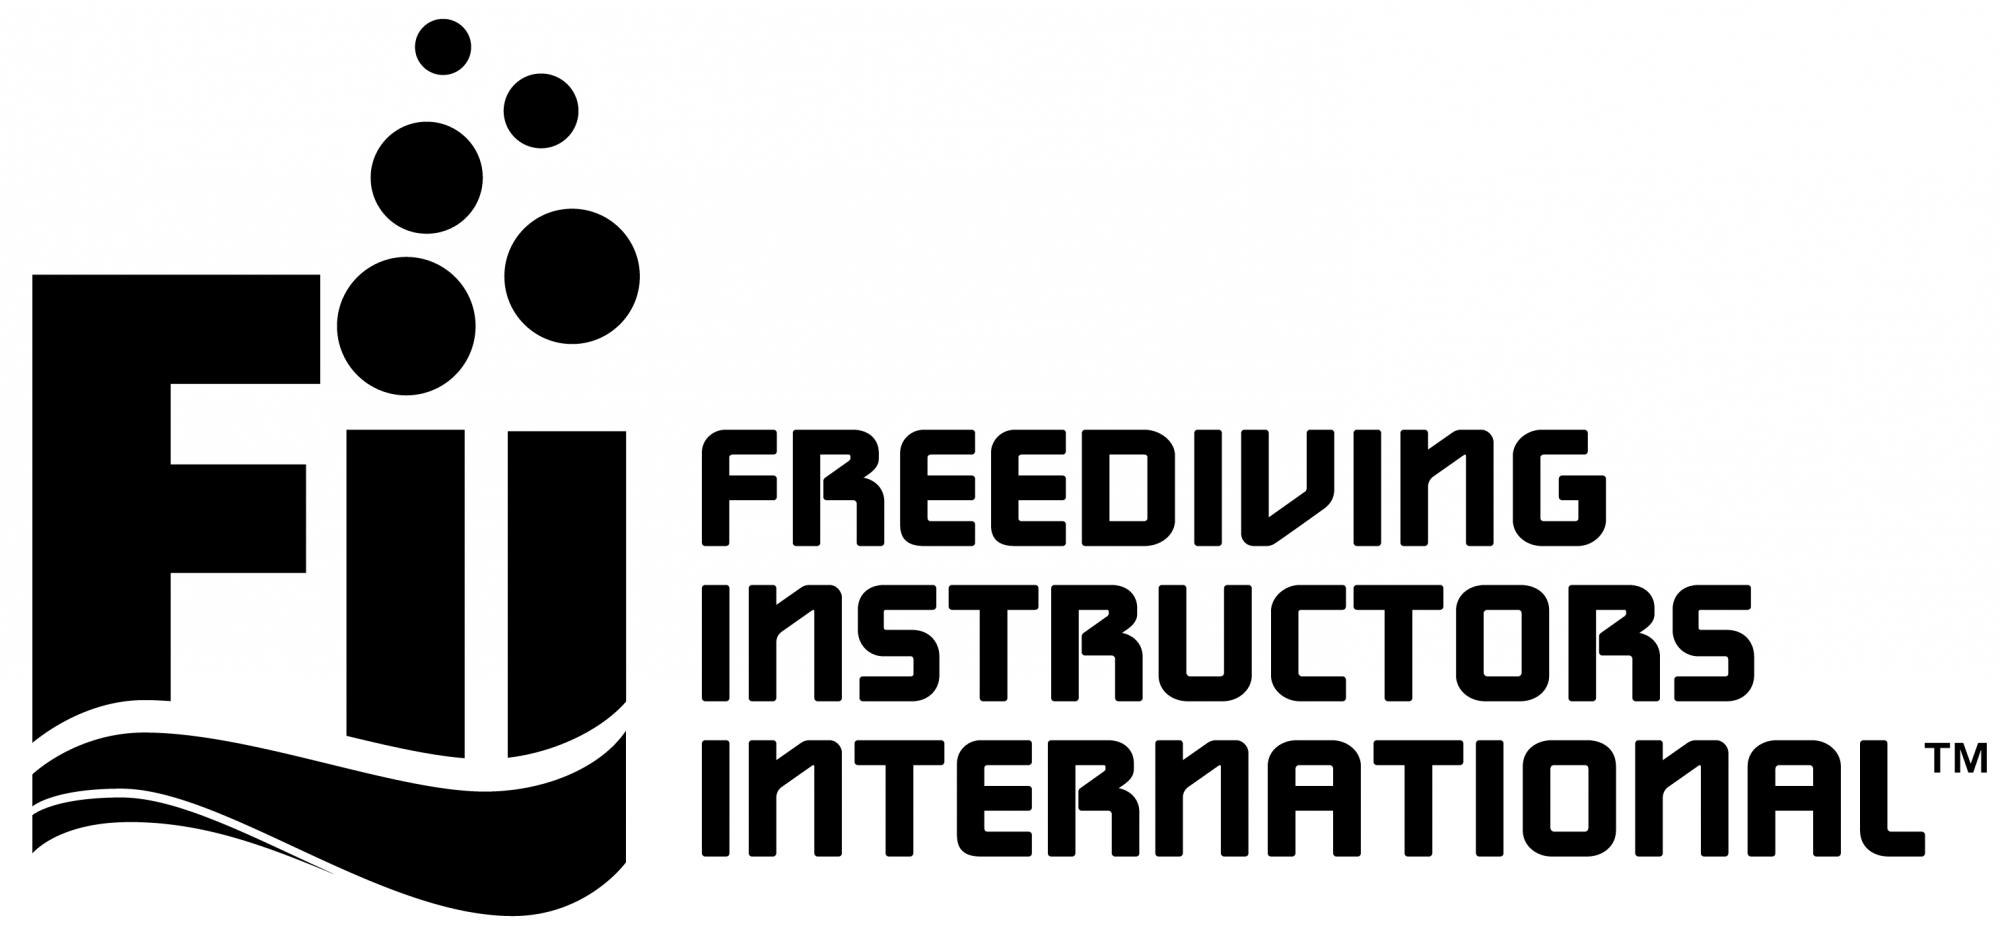 Freediving Instructors International Beginner Class